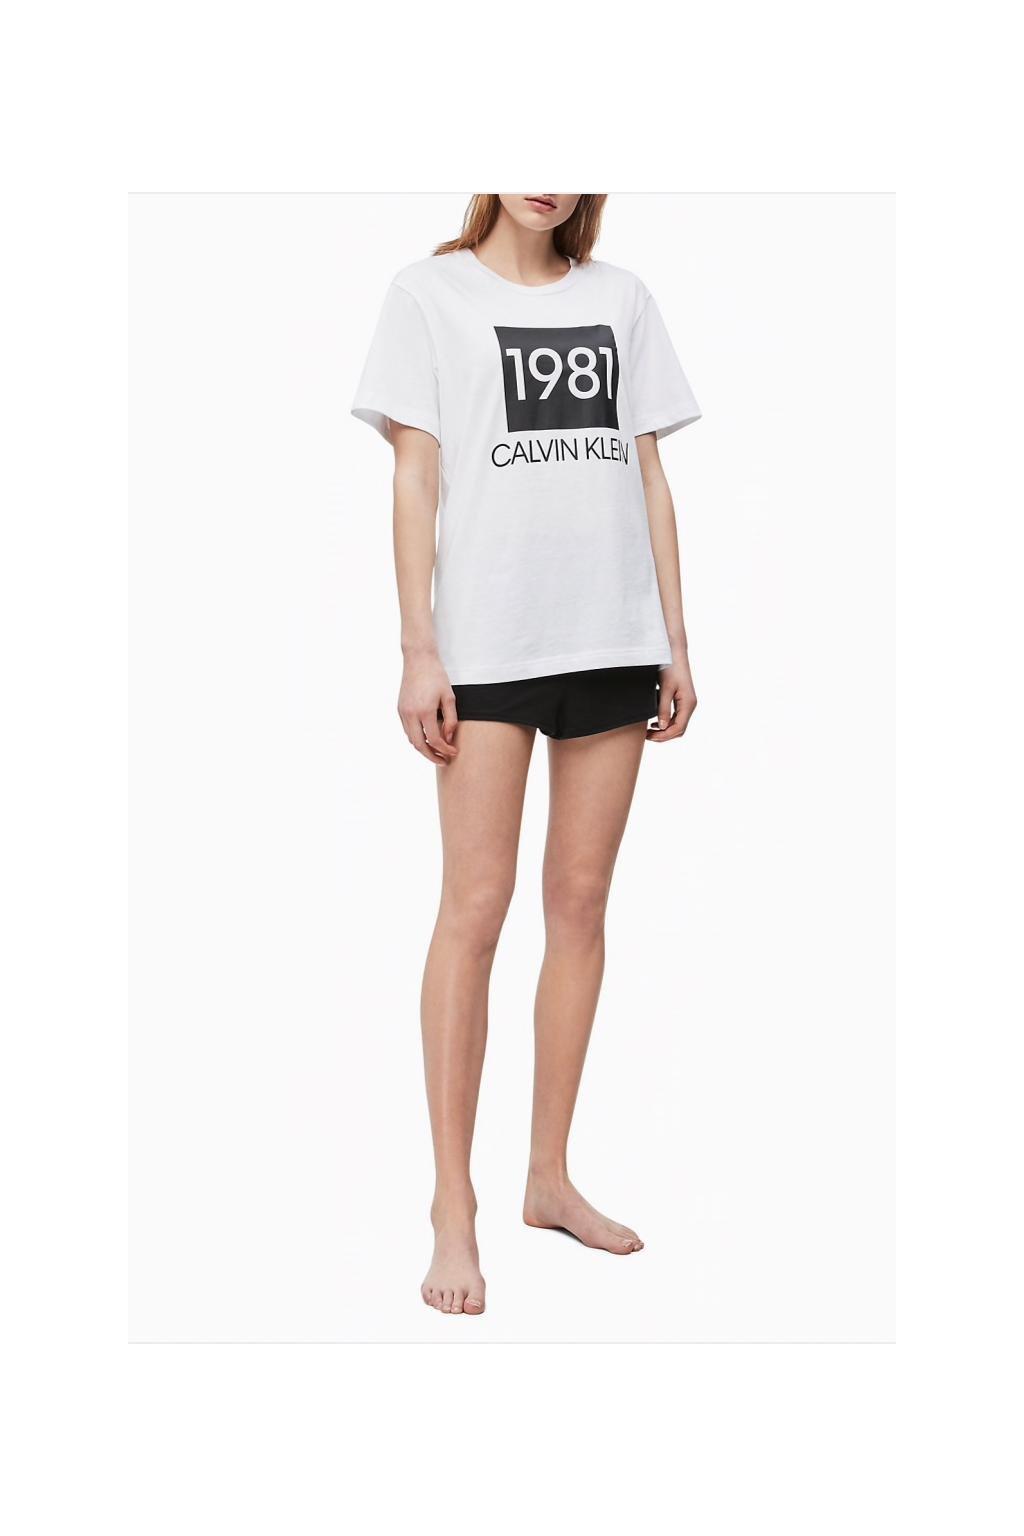 Calvin Klein dámské tričko 1981 Bold - bílé